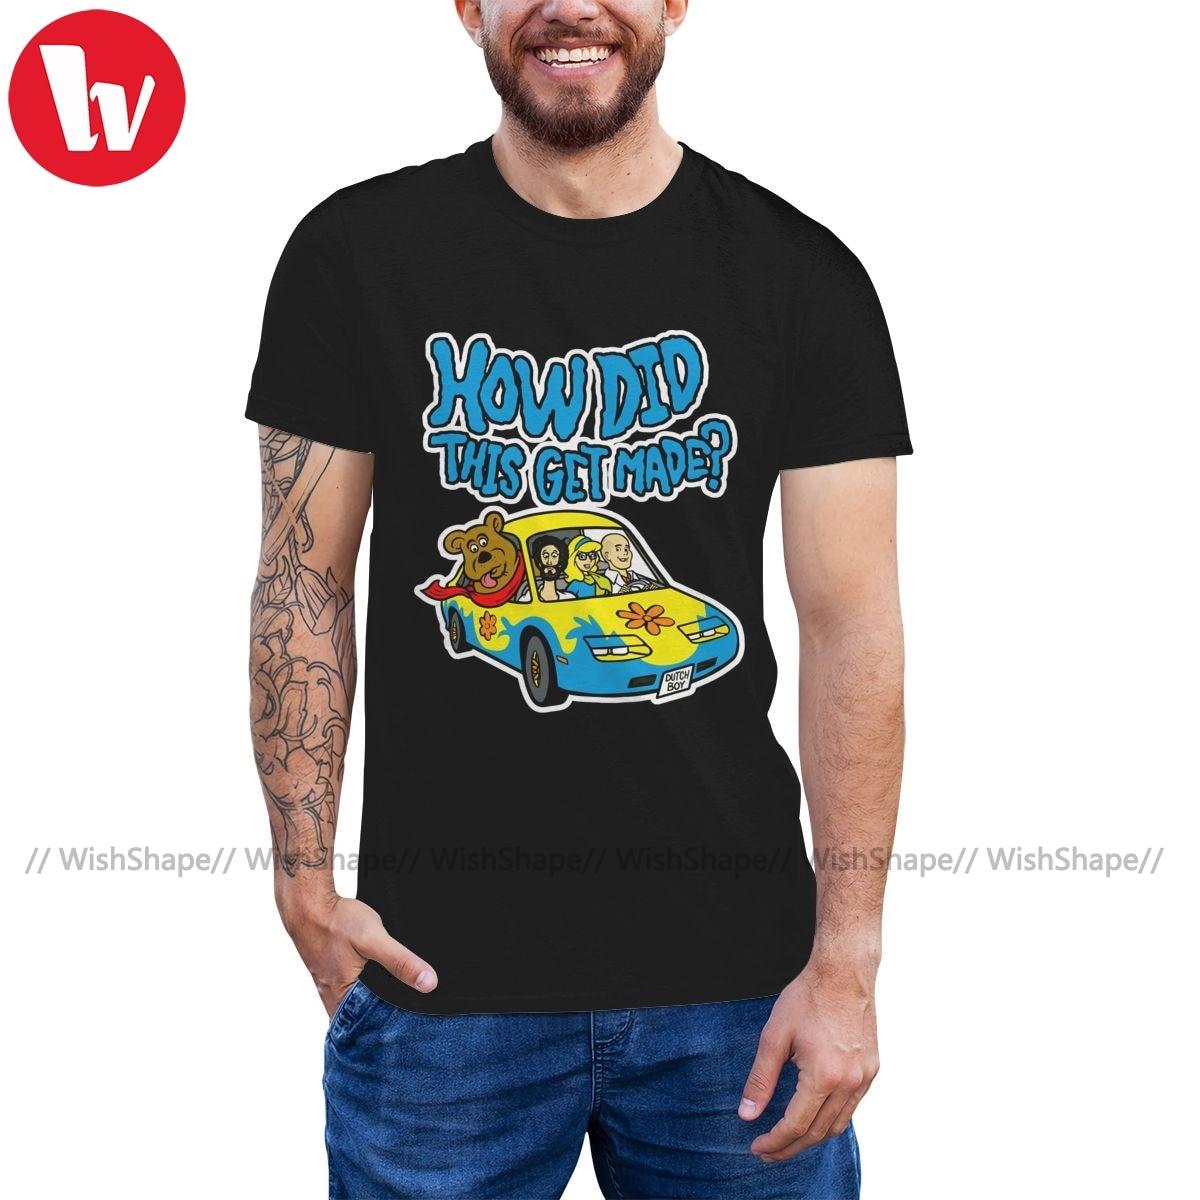 Camiseta de Scooby, camiseta HDTGM gooby-doo y The Mystery Of psychophatic, camiseta impresionante para hombre